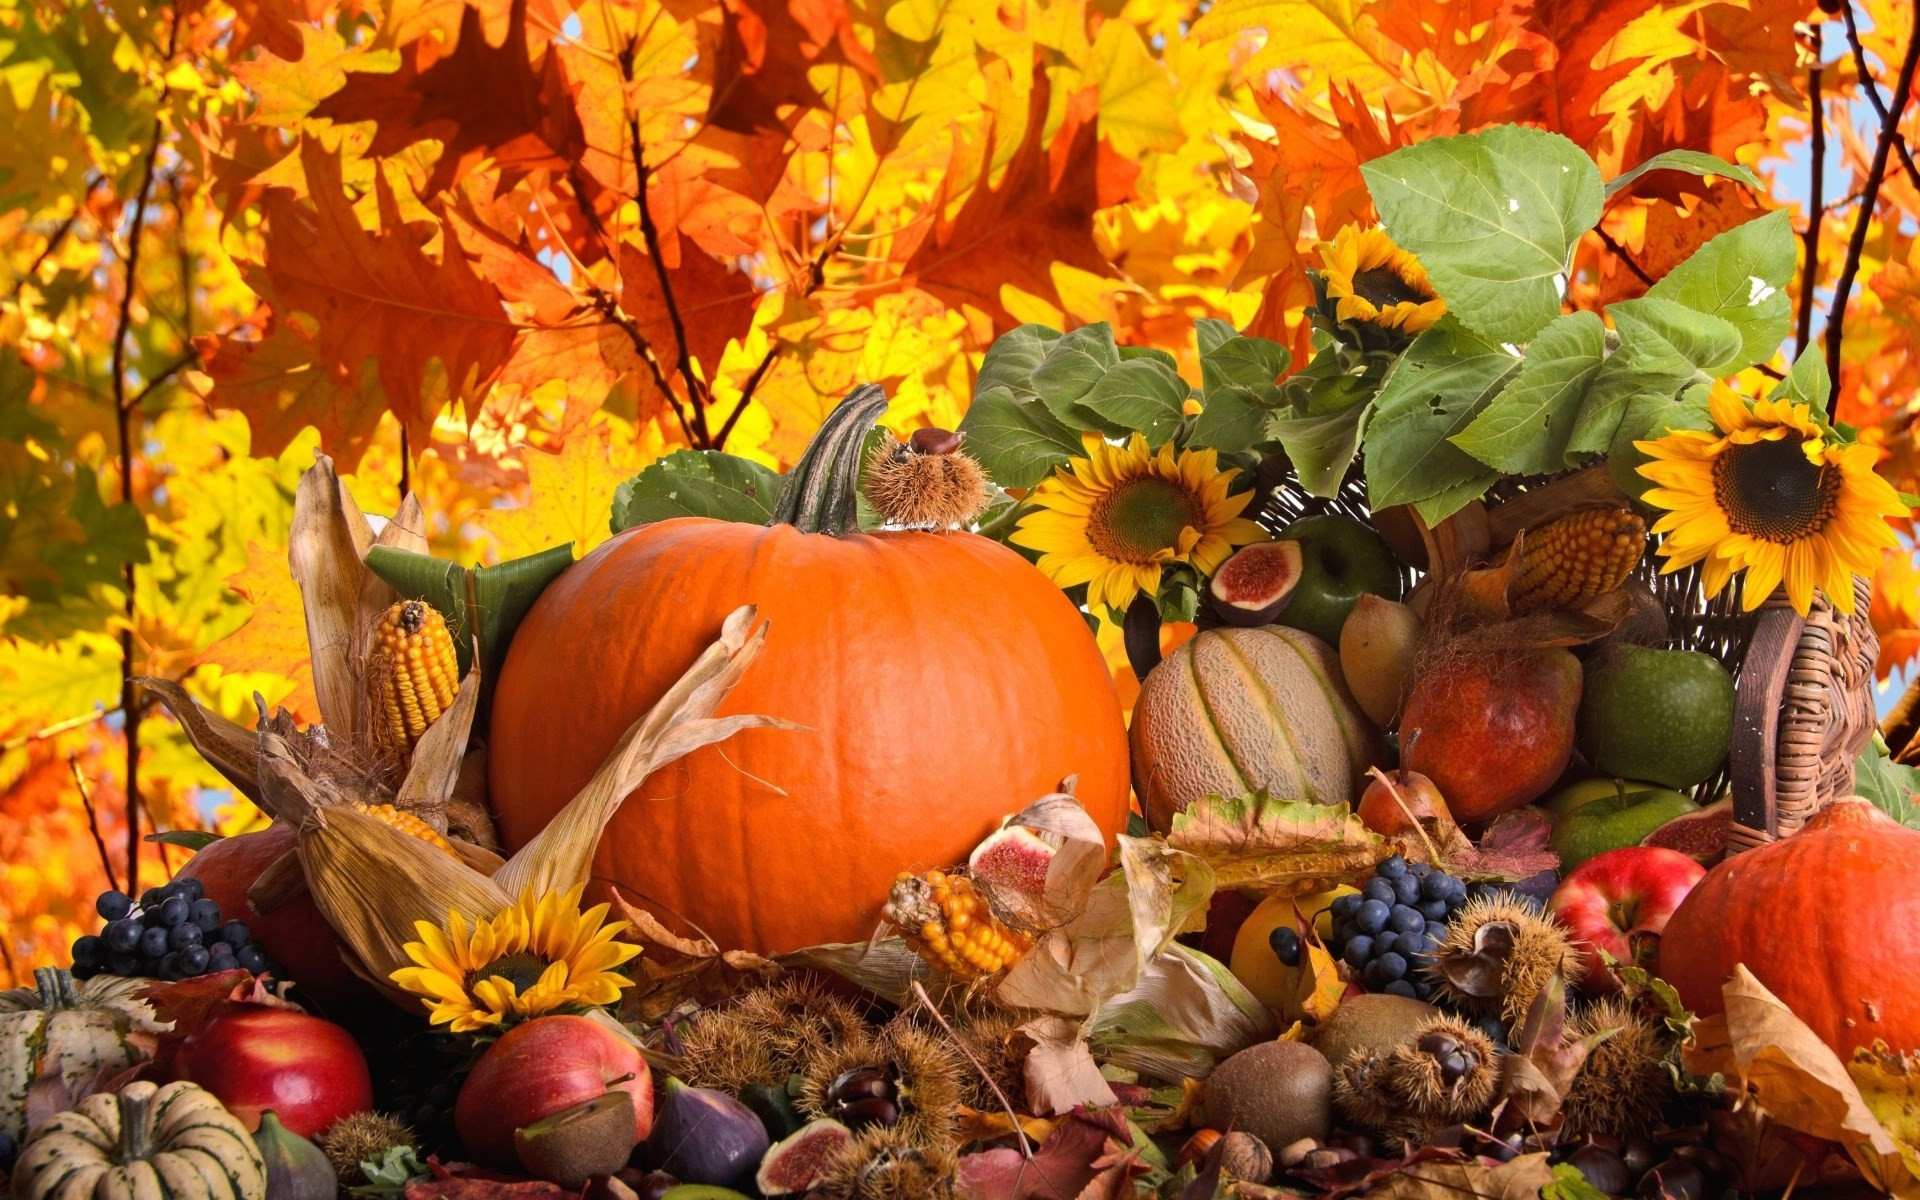 Paige Sheldon – pumpkin fall backgrounds for laptop – 1920 x 1200 px